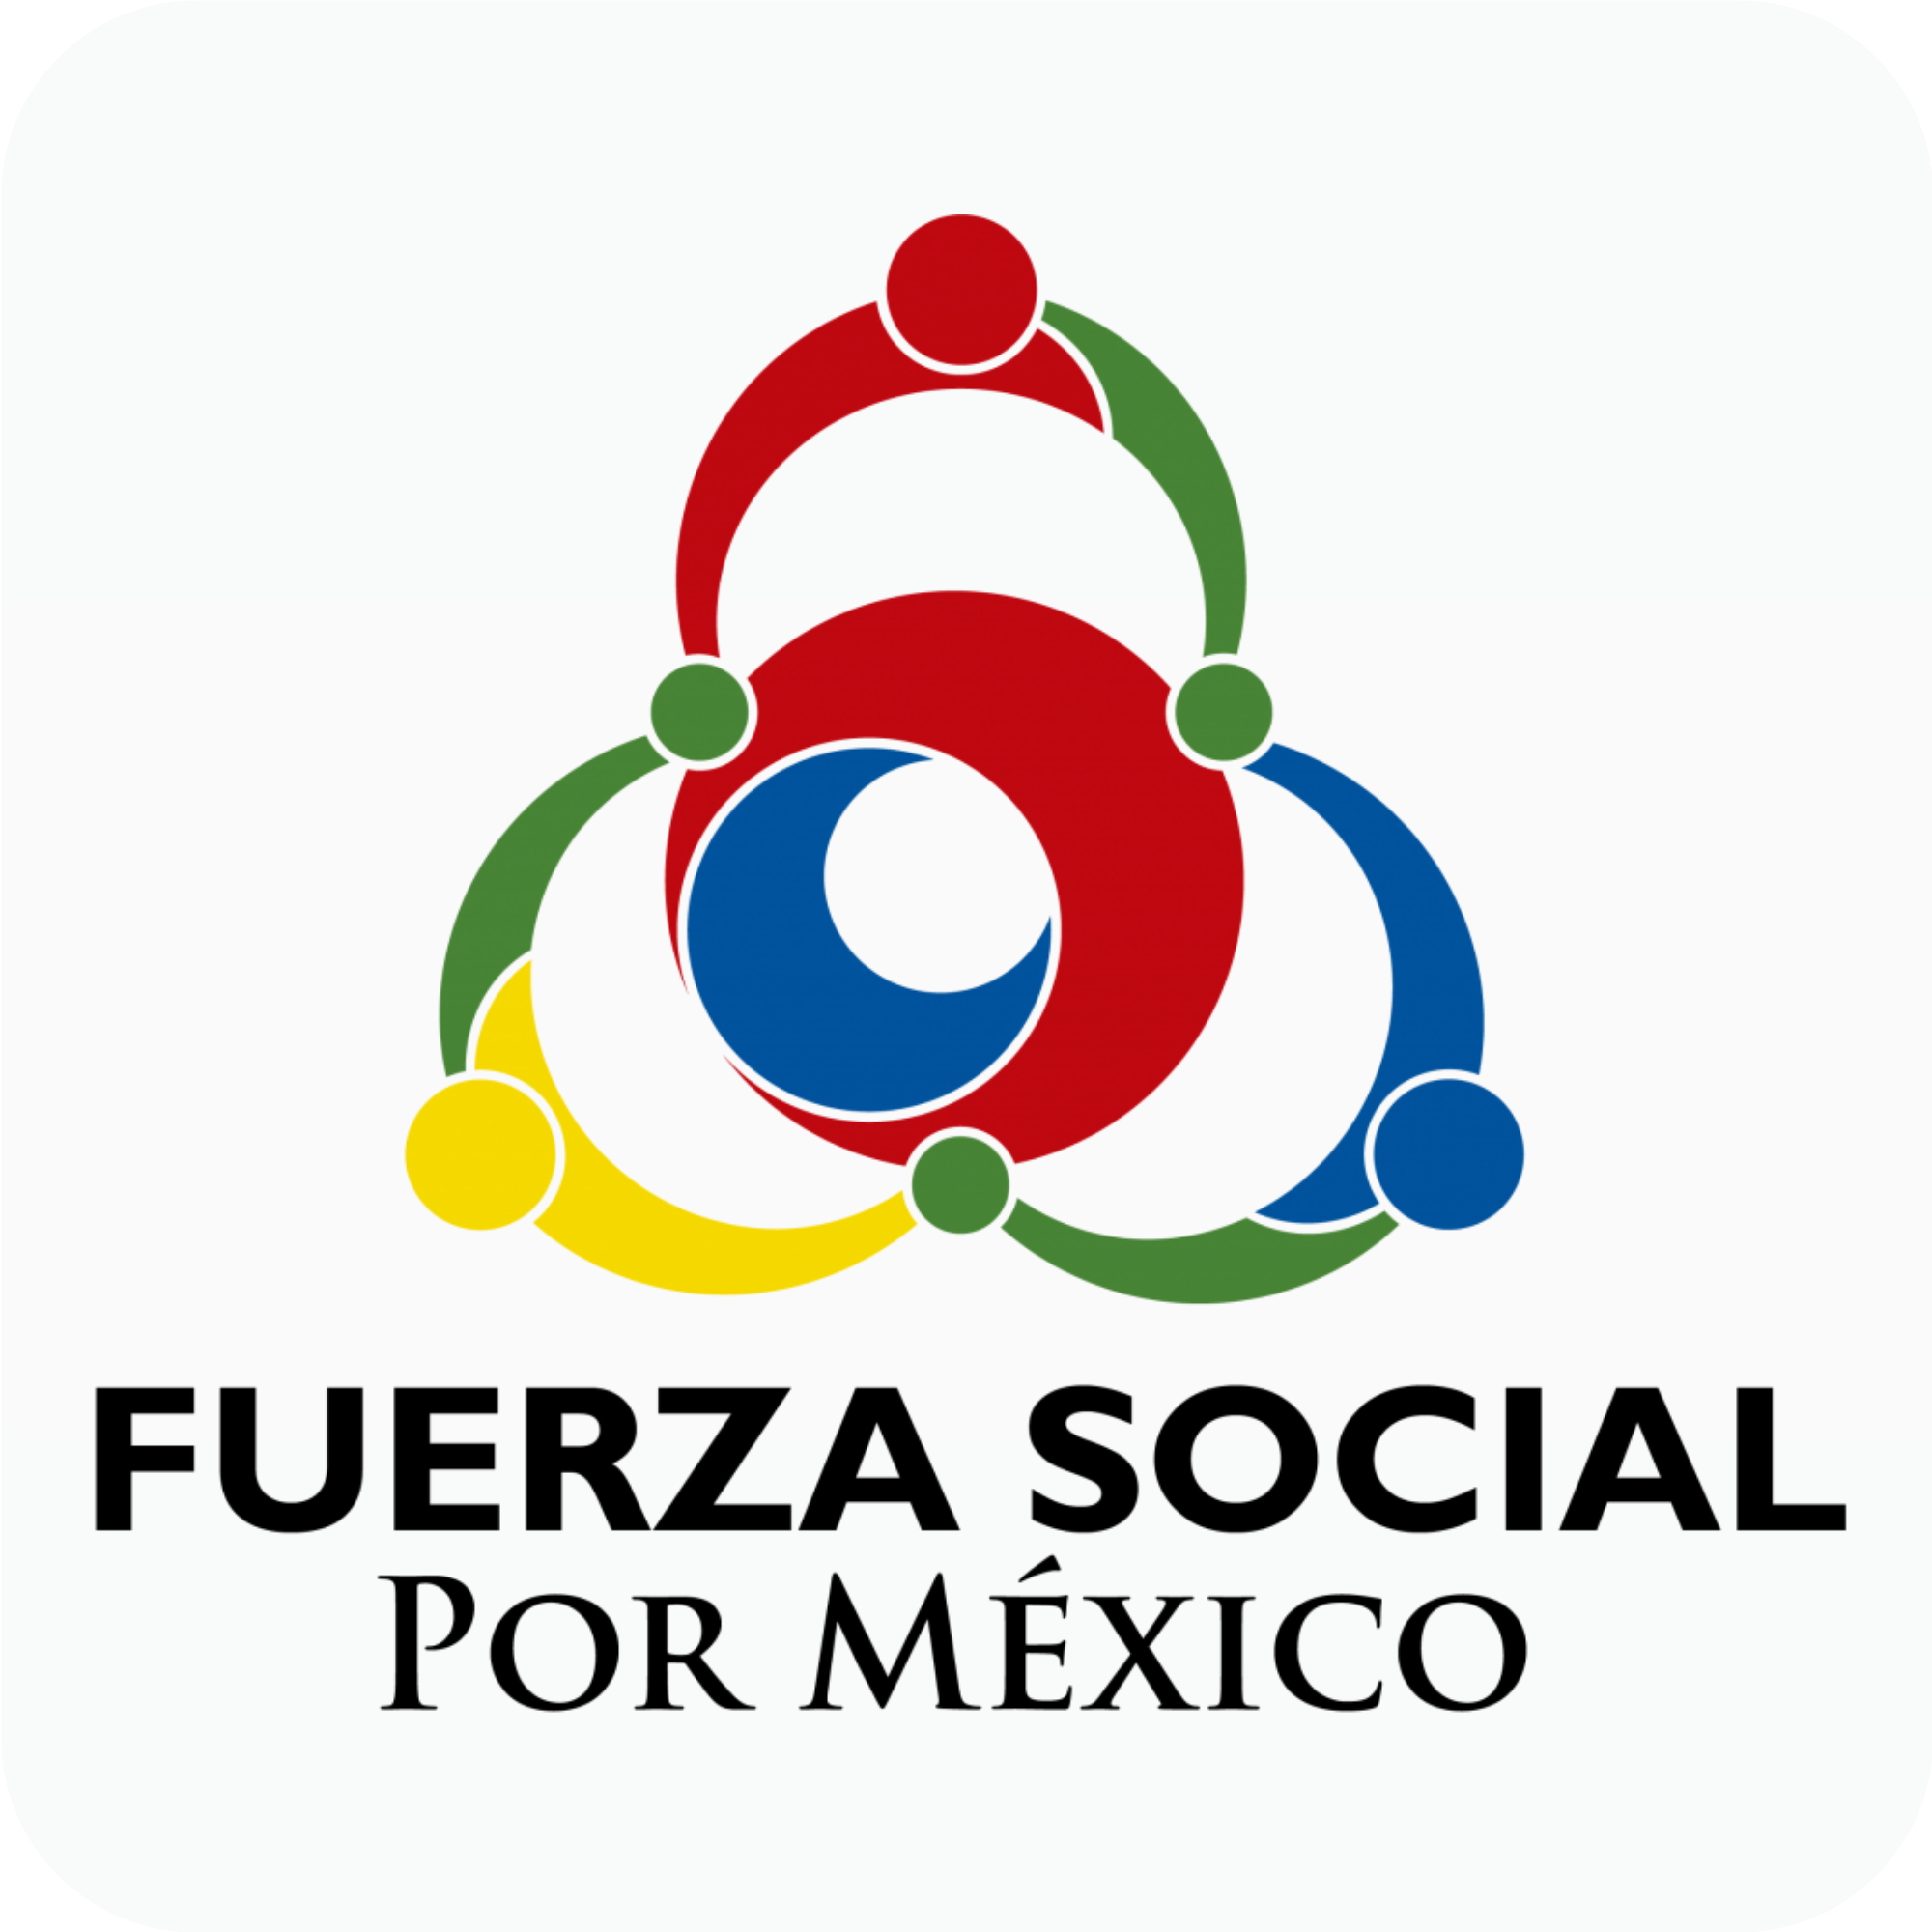 Archivo:Fuerza Social por México logo png.png - Wikipedia, la enciclopedia libre